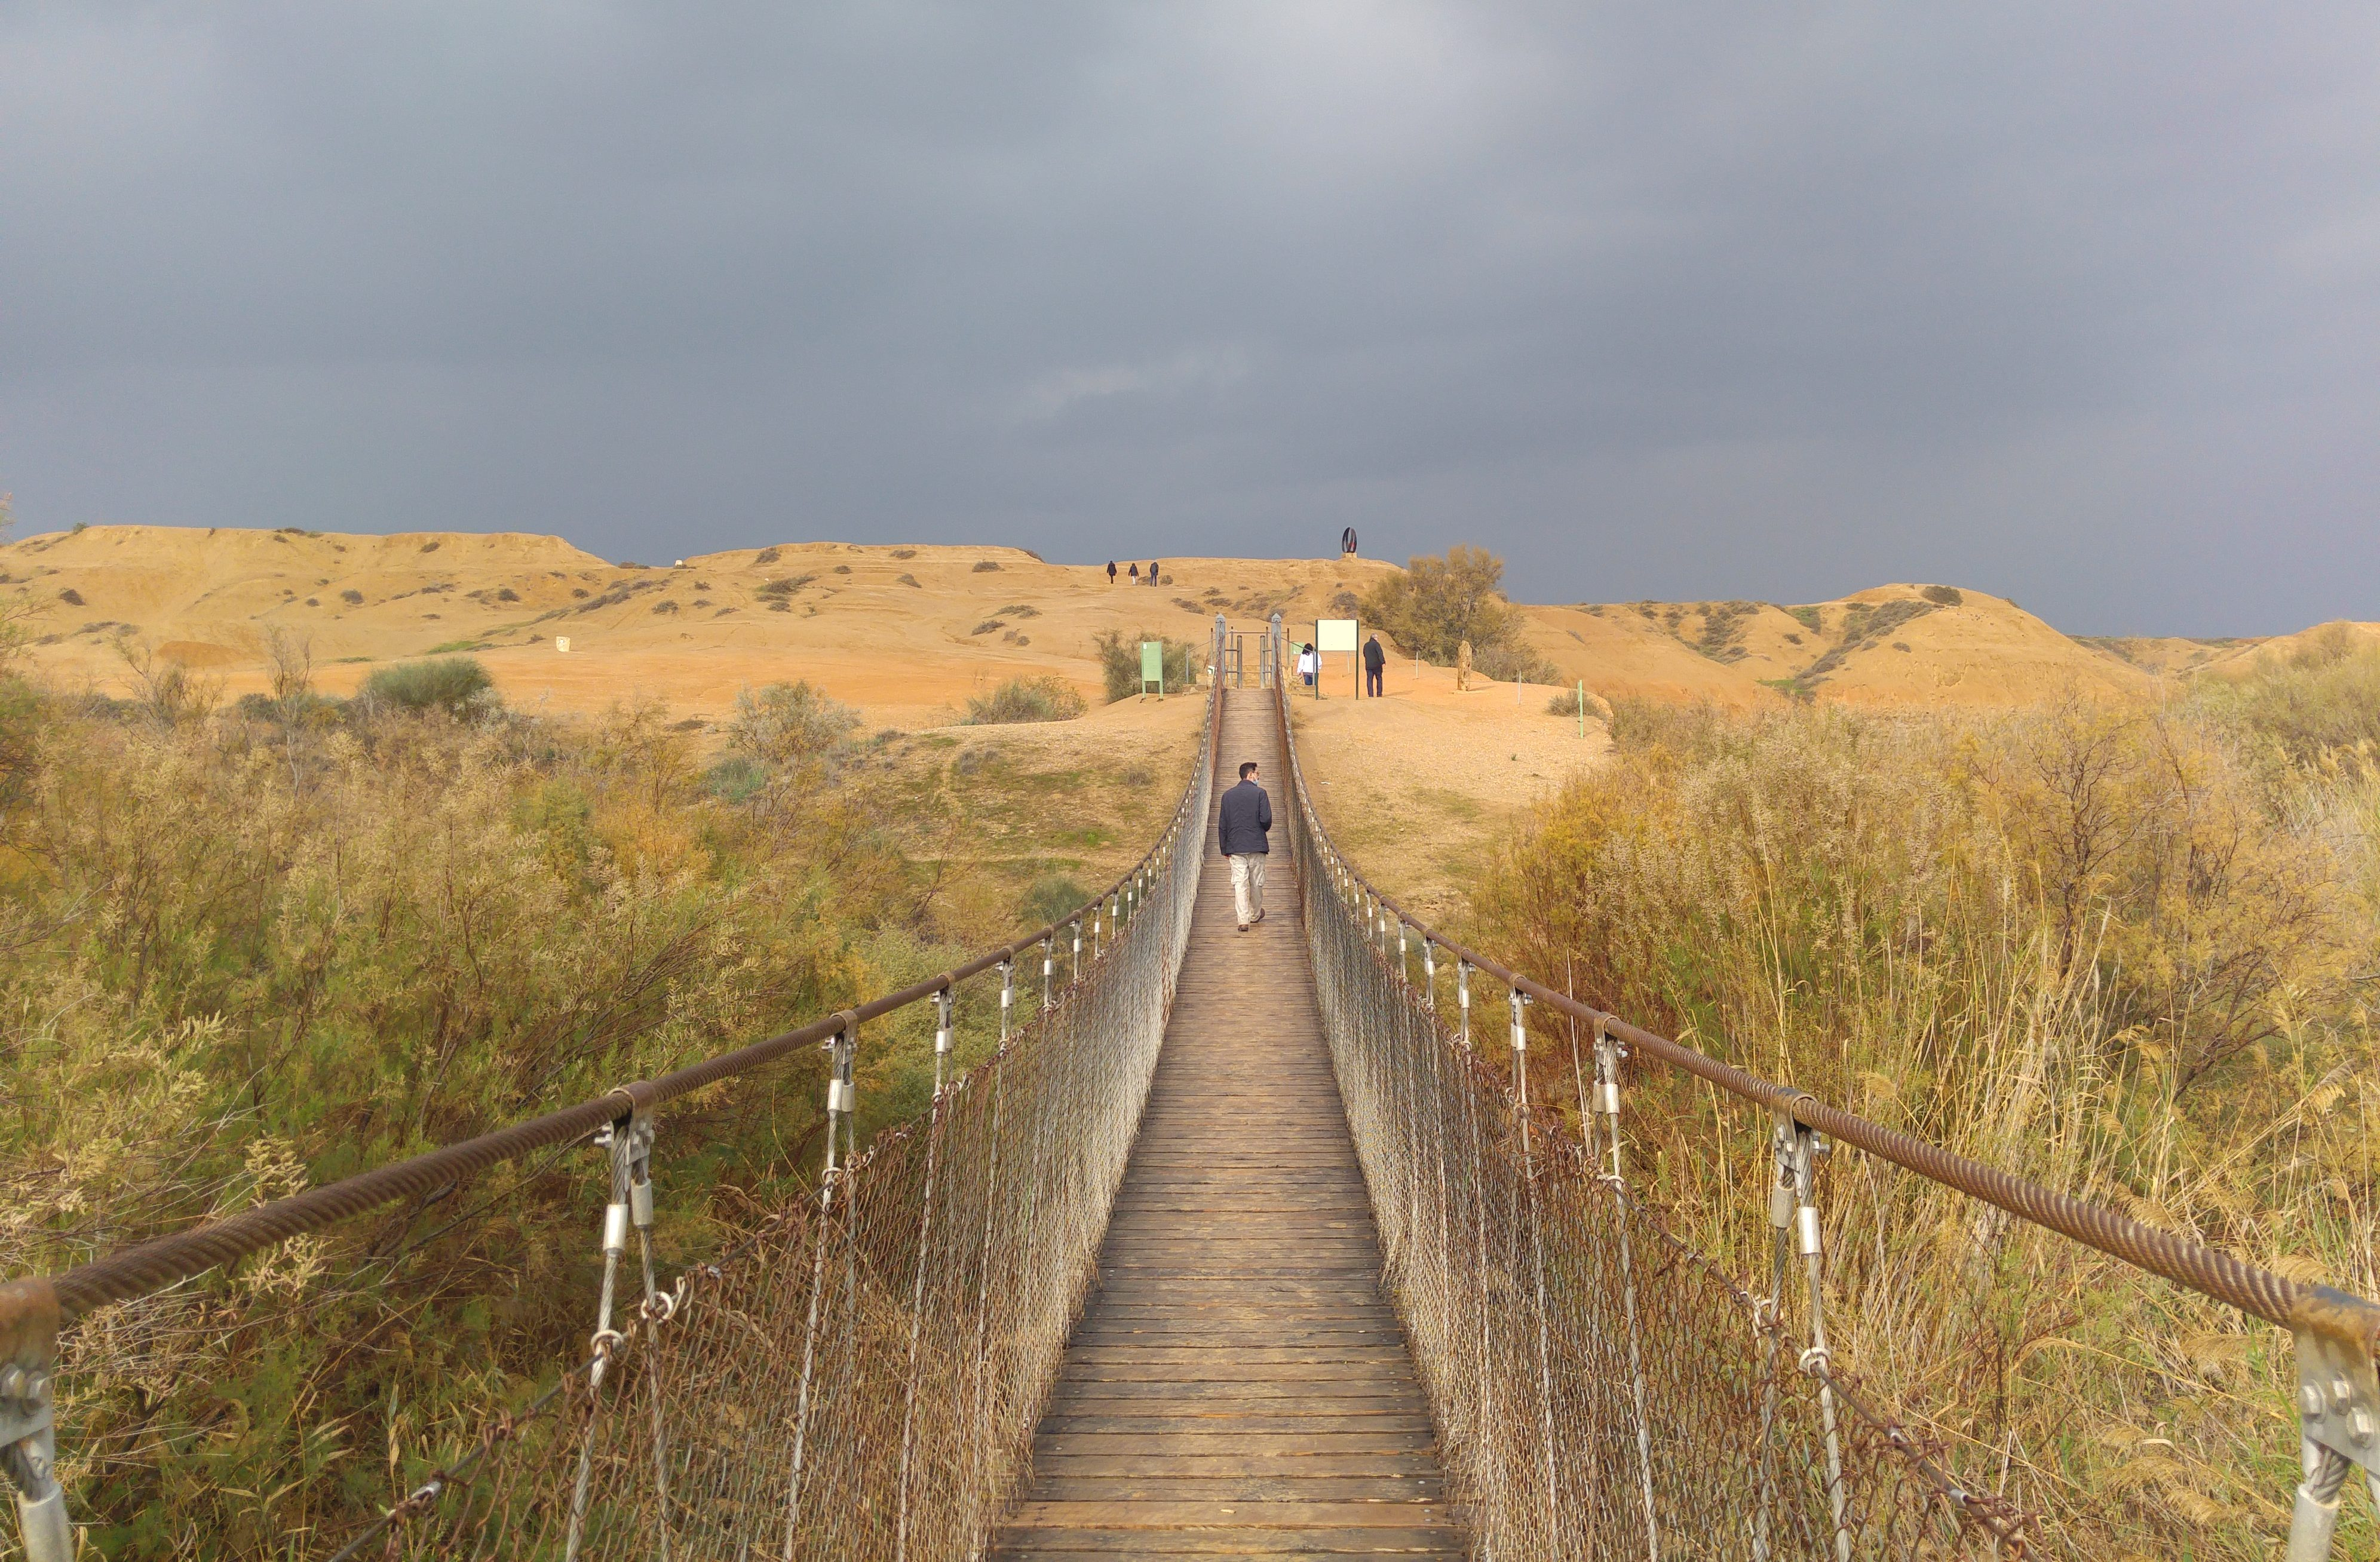 Crossing the hanging bridge over Nachal HaBesor